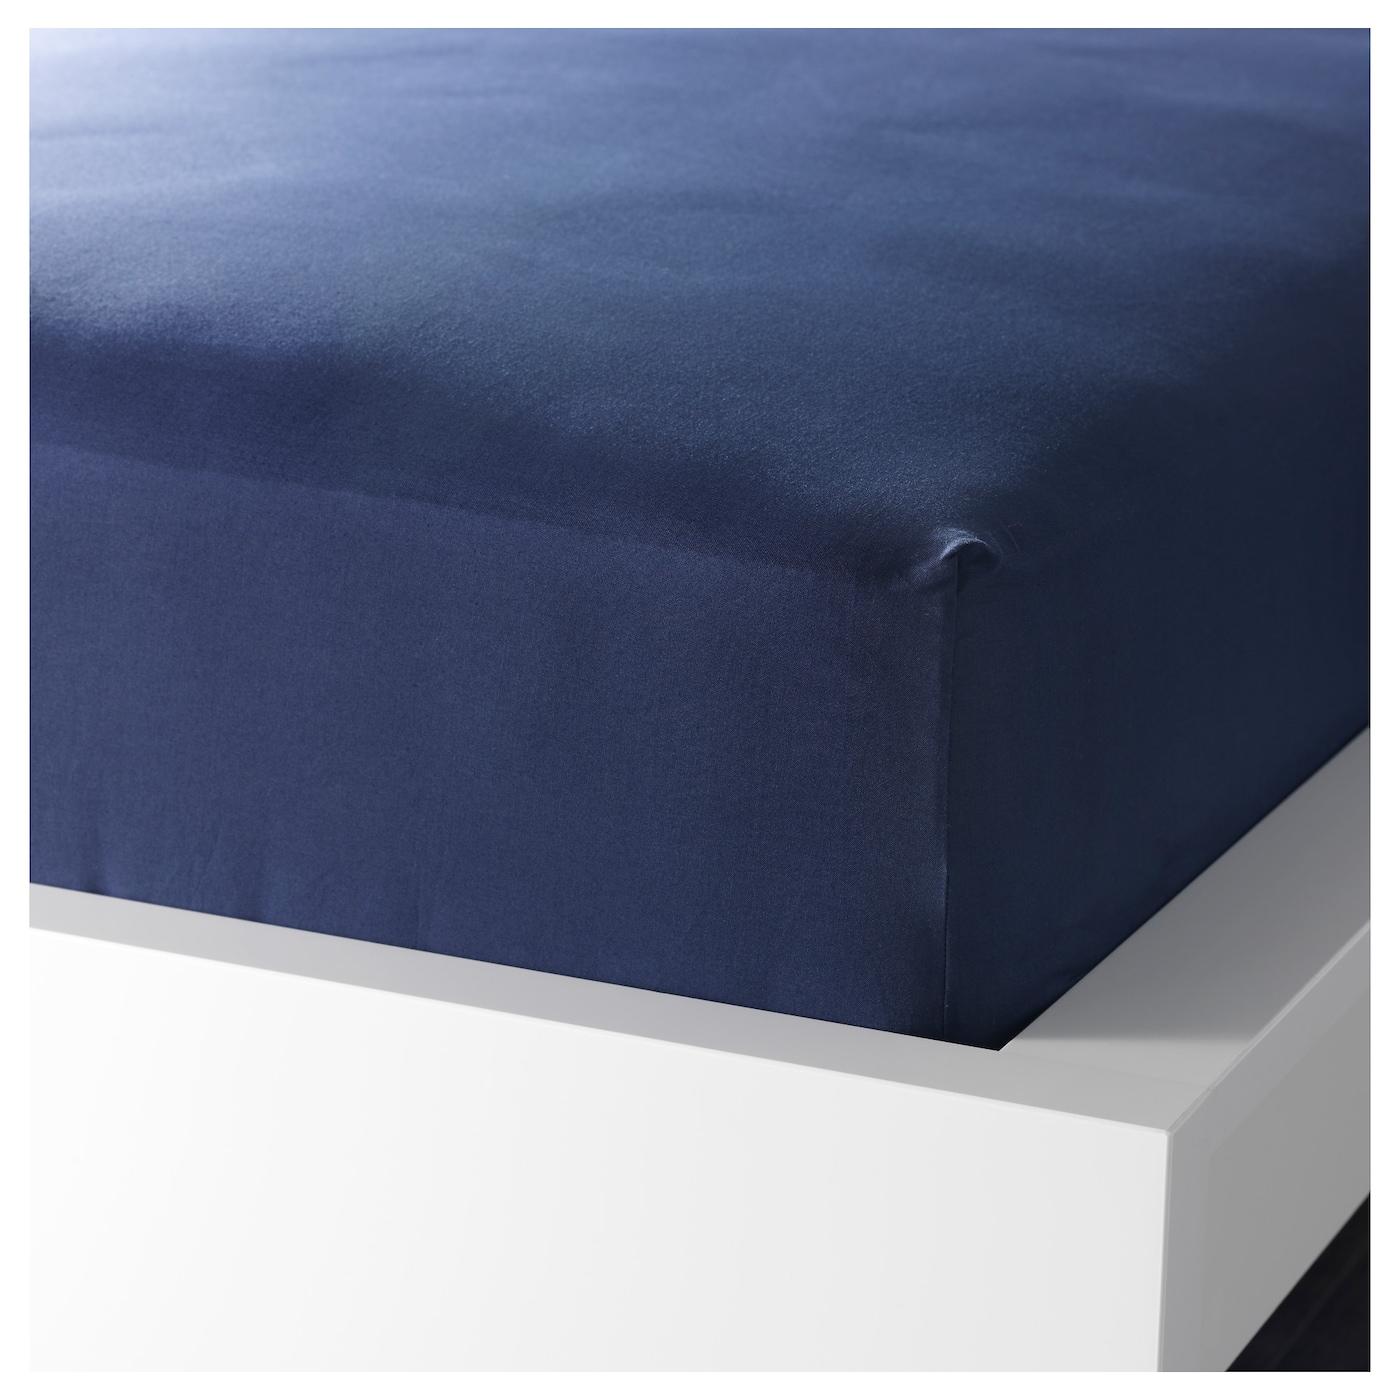 dvala fitted sheet dark blue 140x200 cm ikea. Black Bedroom Furniture Sets. Home Design Ideas